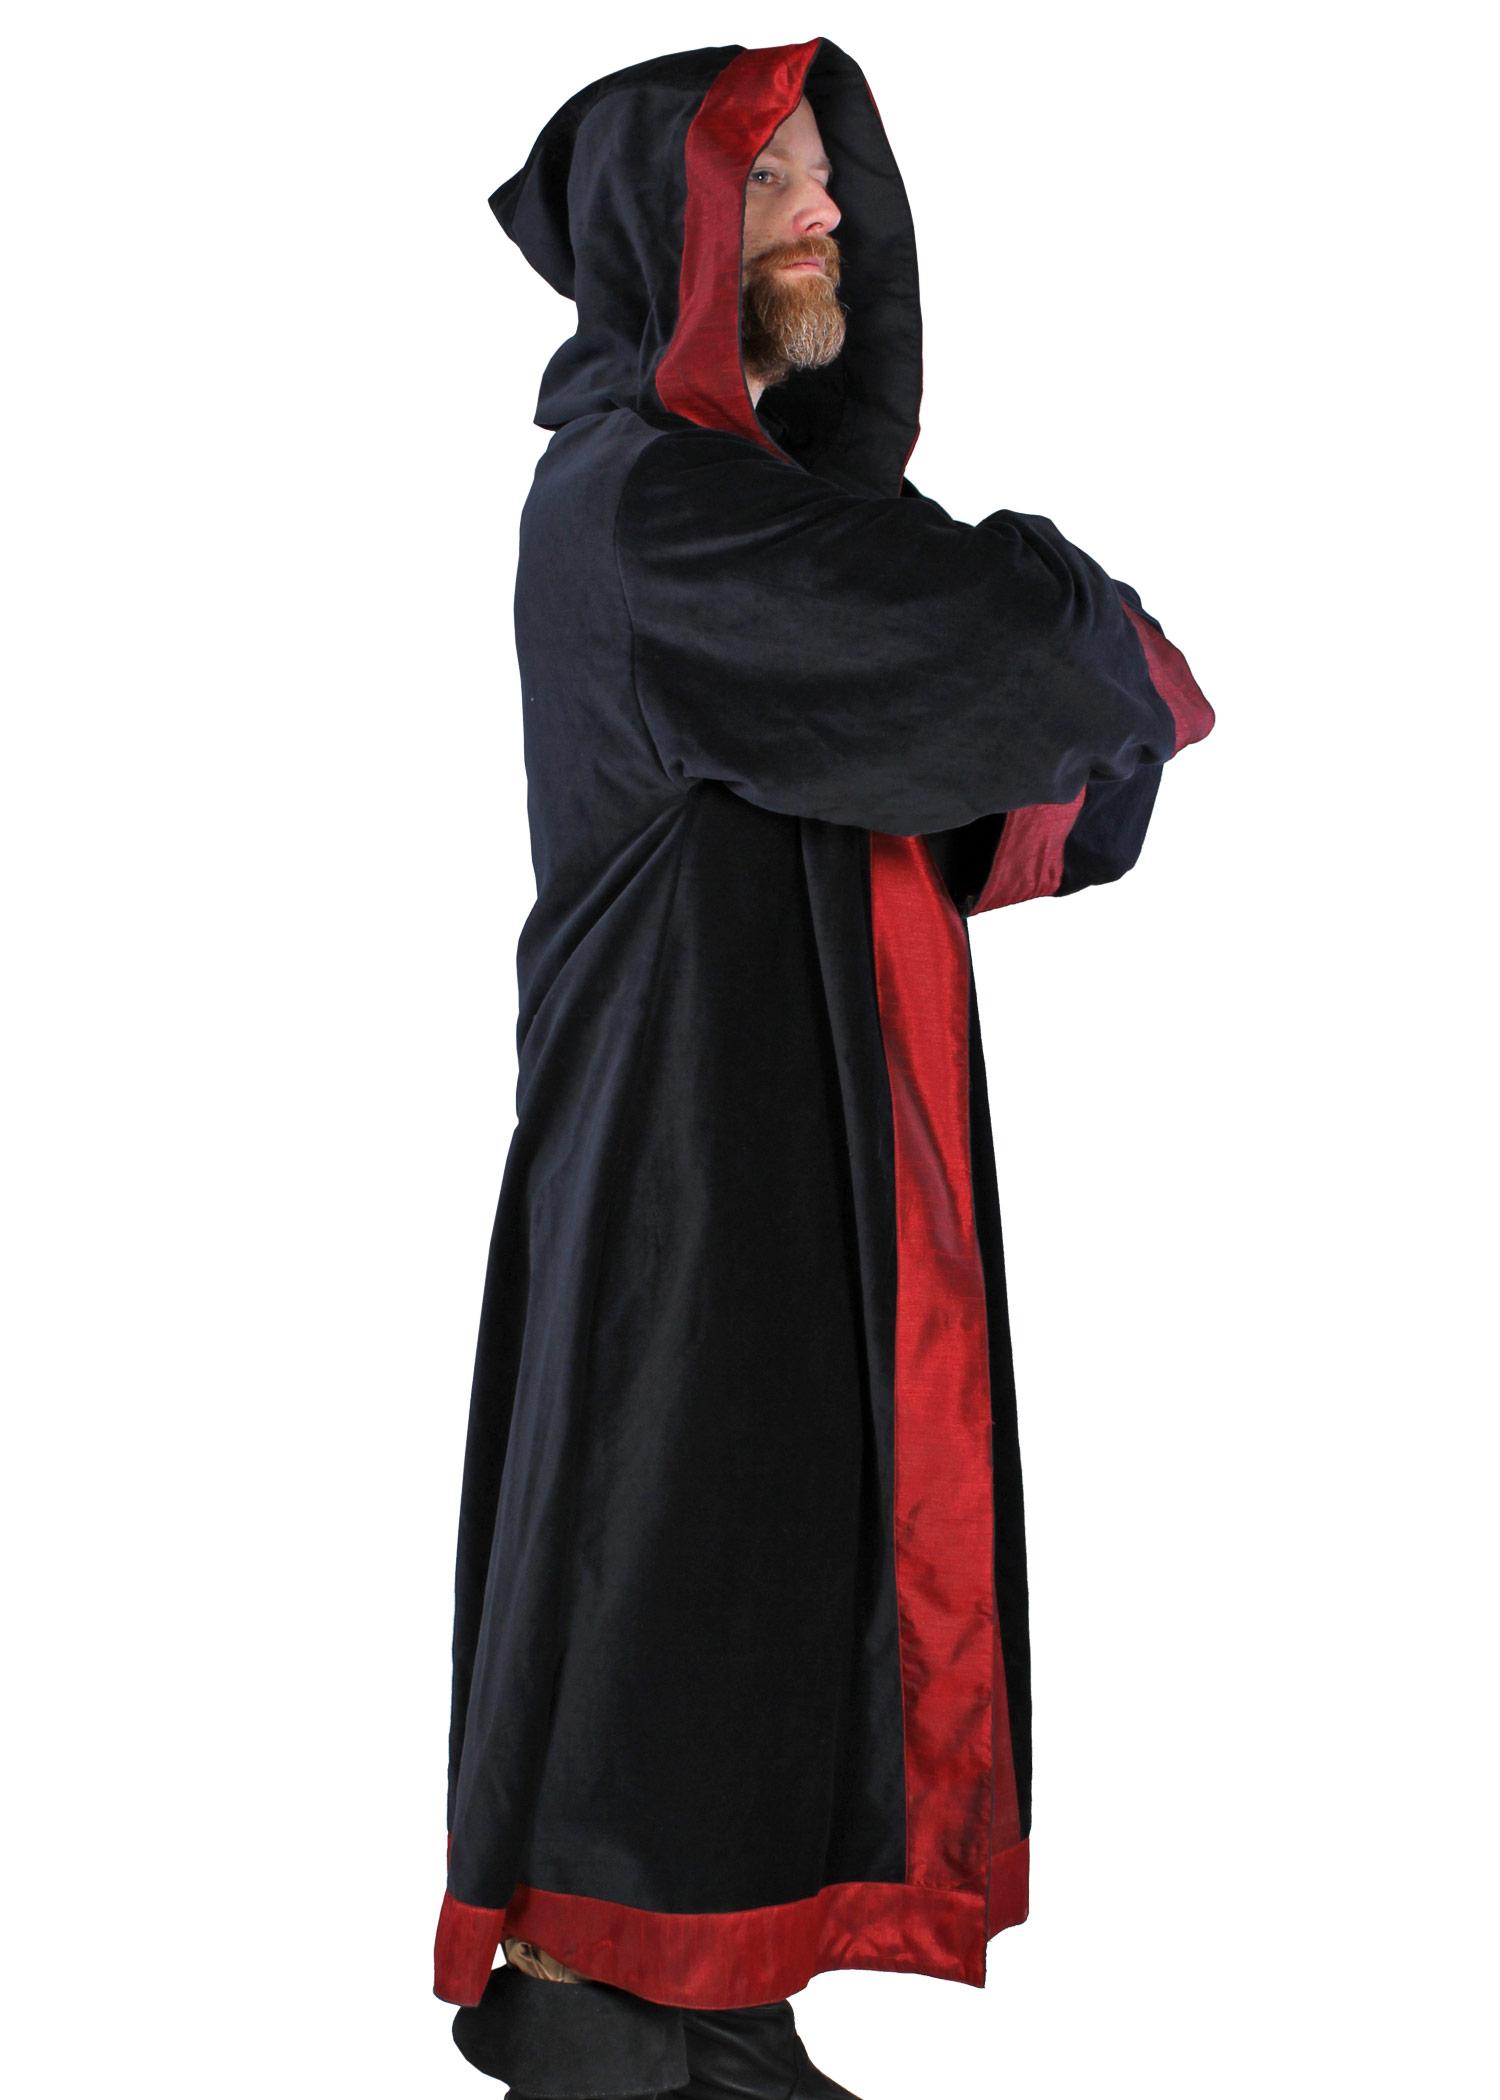 Mittelalter Mantel, Larp Umhang & Magierrobe kaufen bei